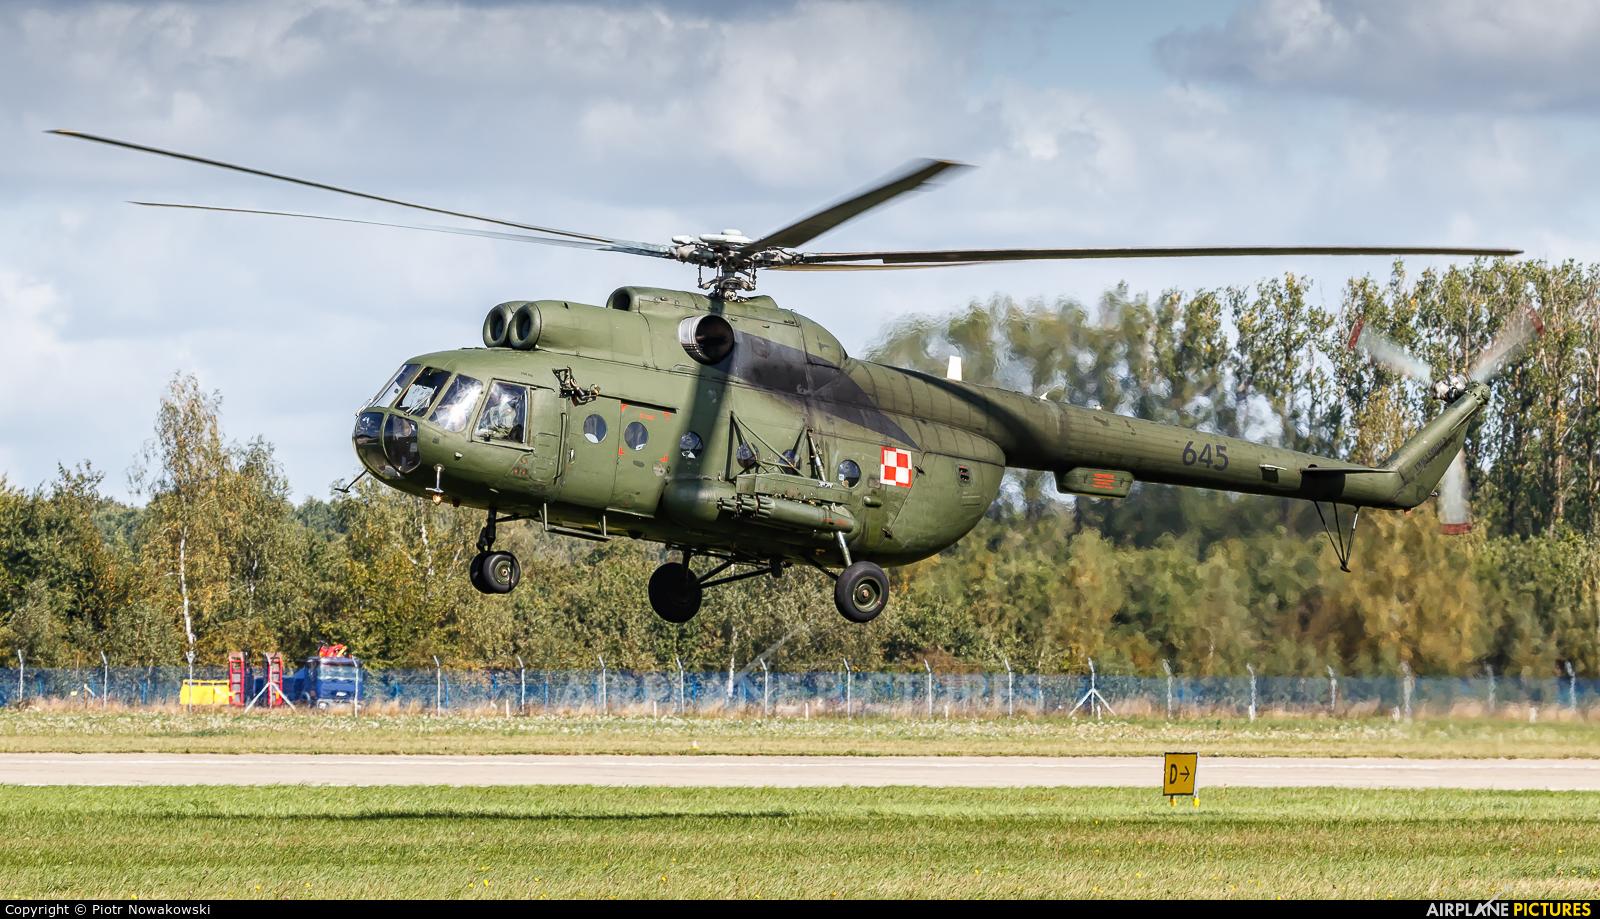 Poland - Army 645 aircraft at Mińsk Mazowiecki